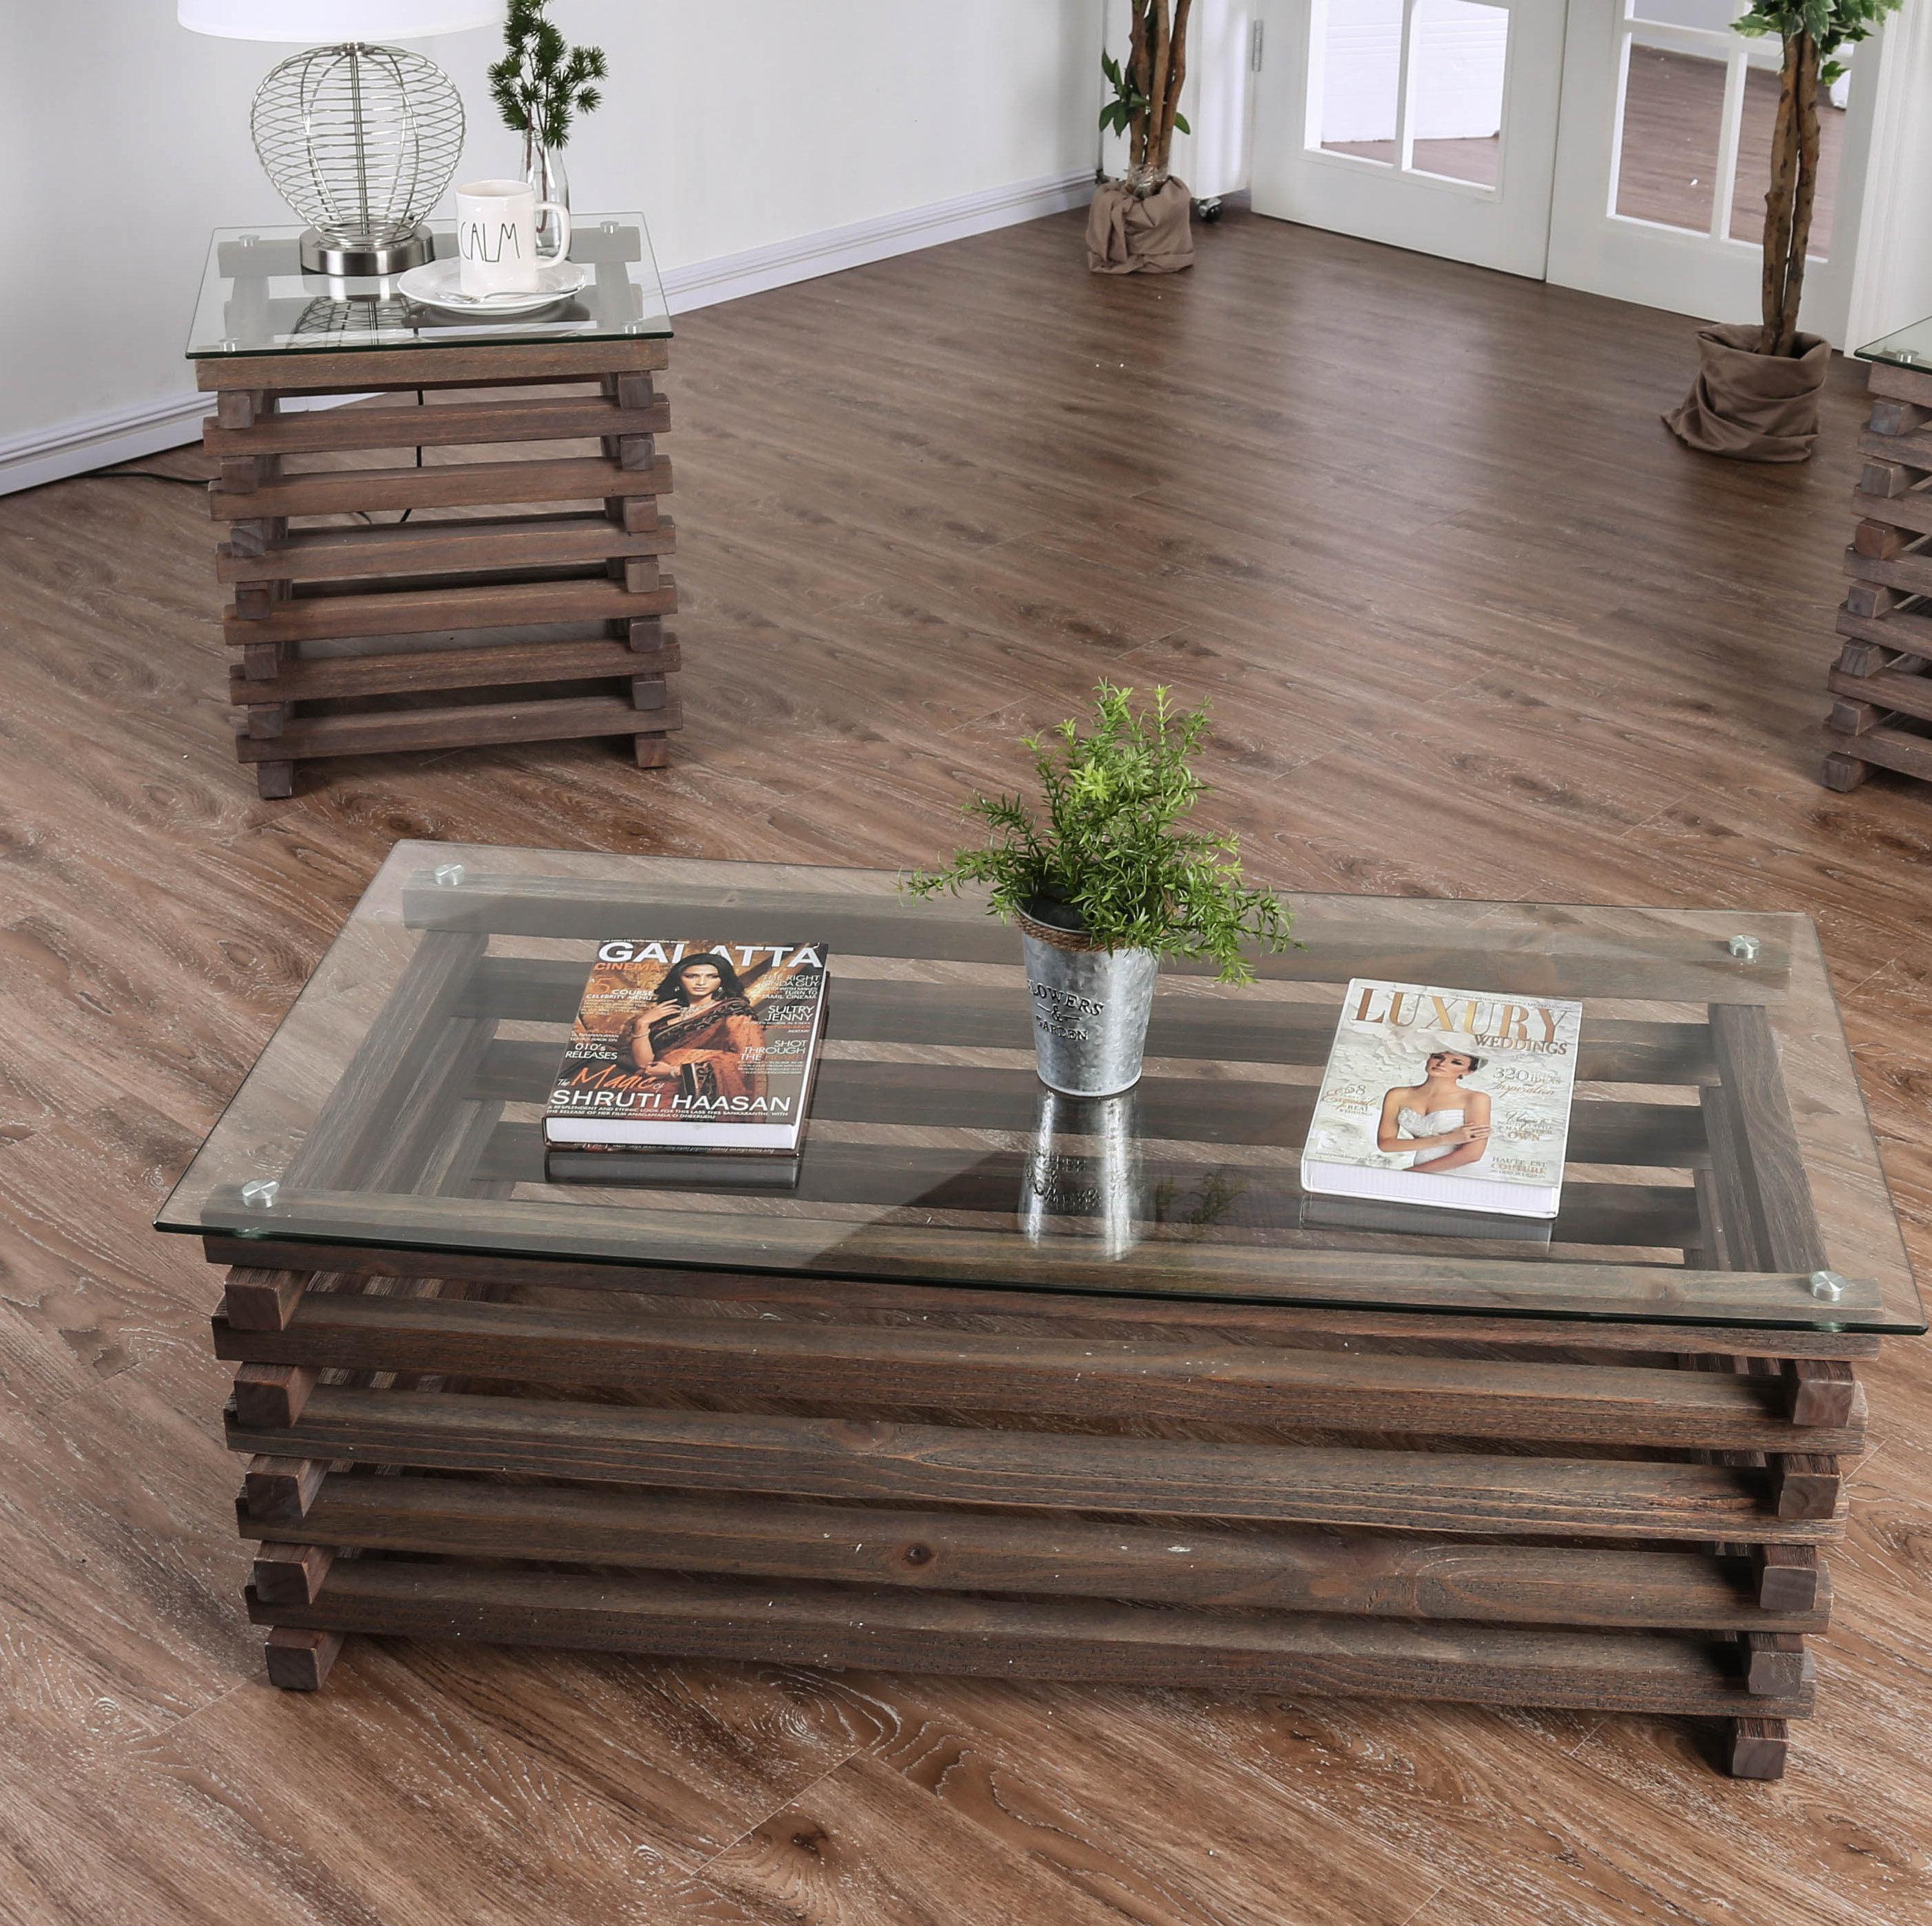 Farmhouse Coffee Table Sets 11